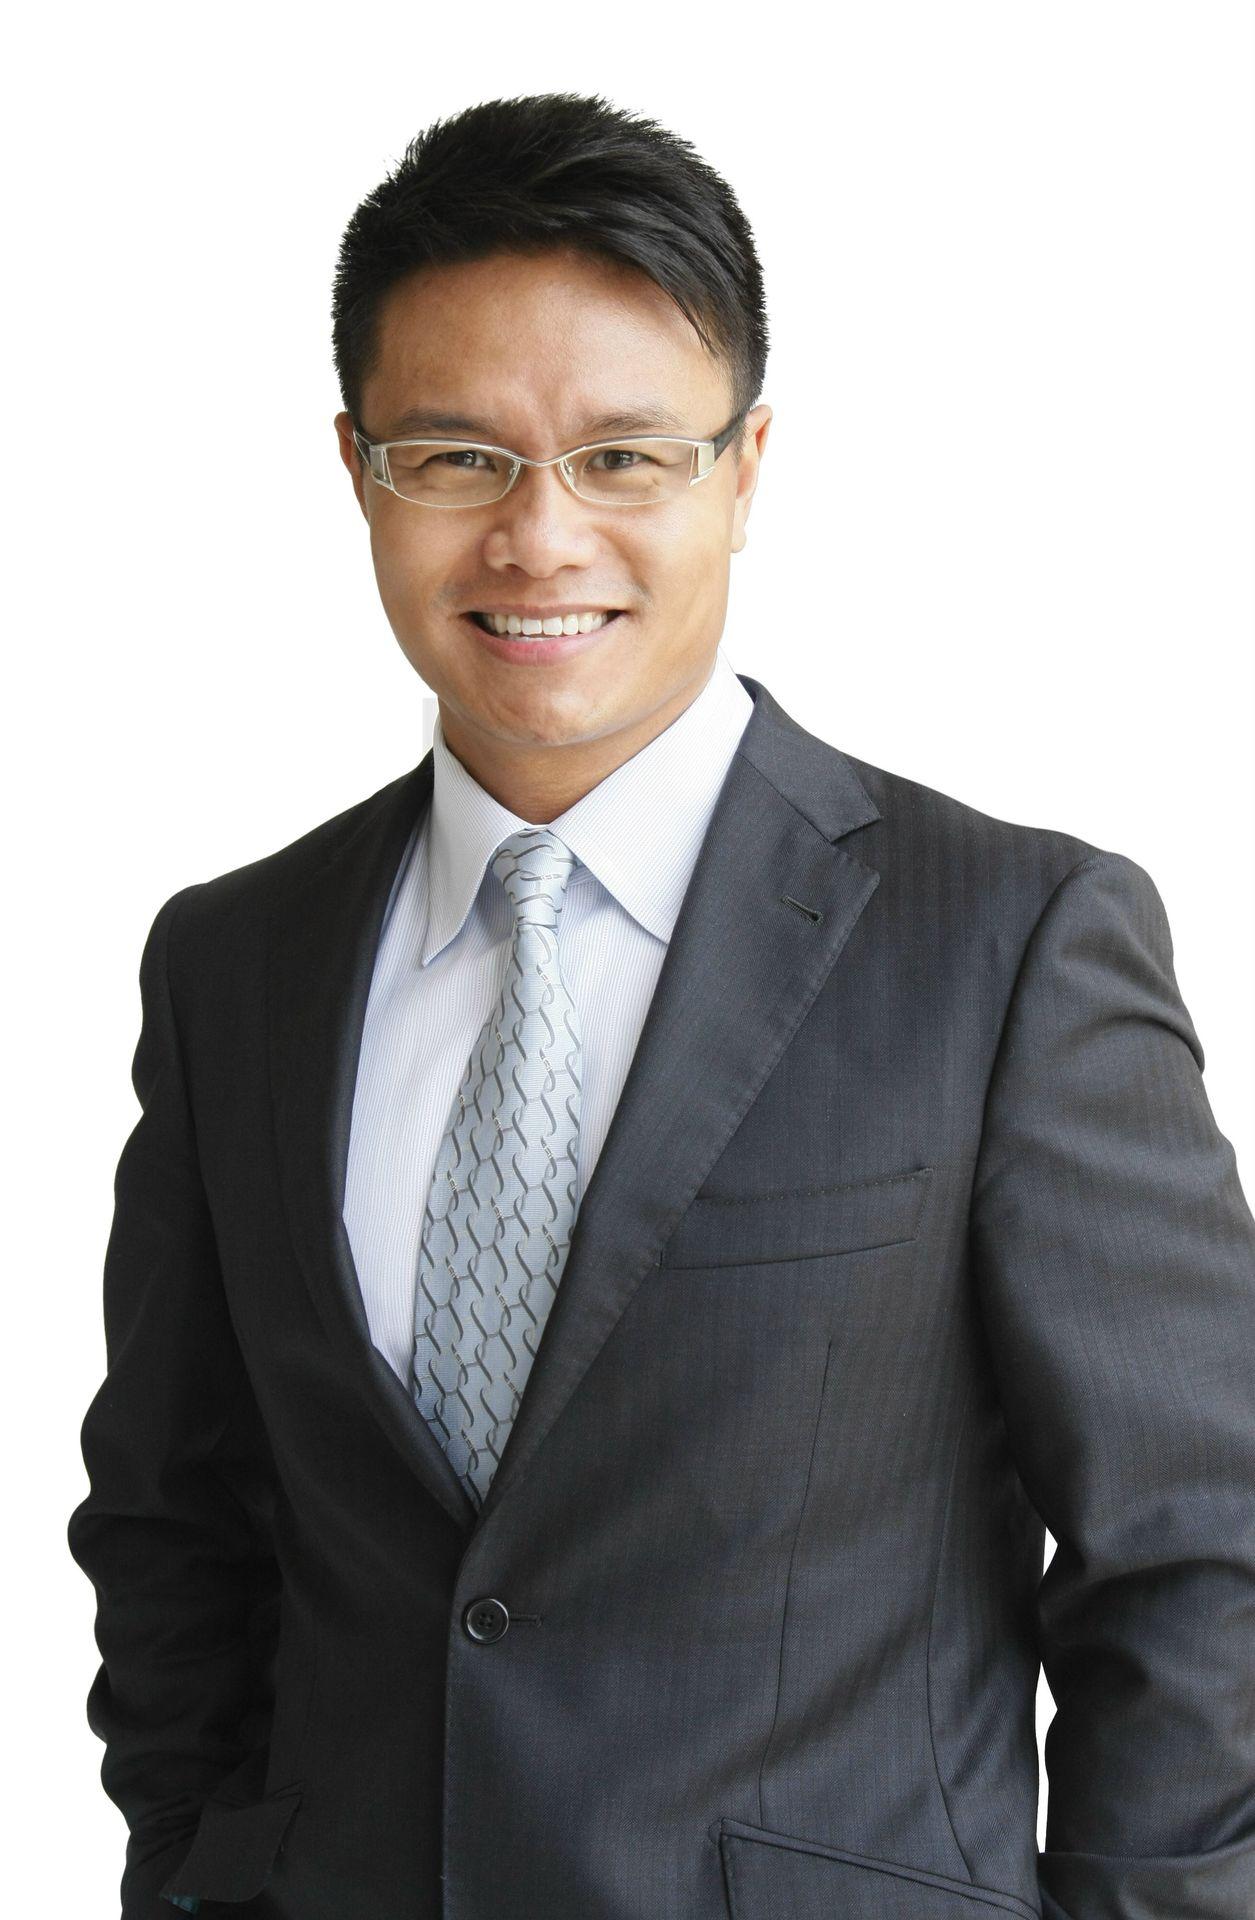 dr._ken_chu_chairman__ceo_mission_hills_group-business-man